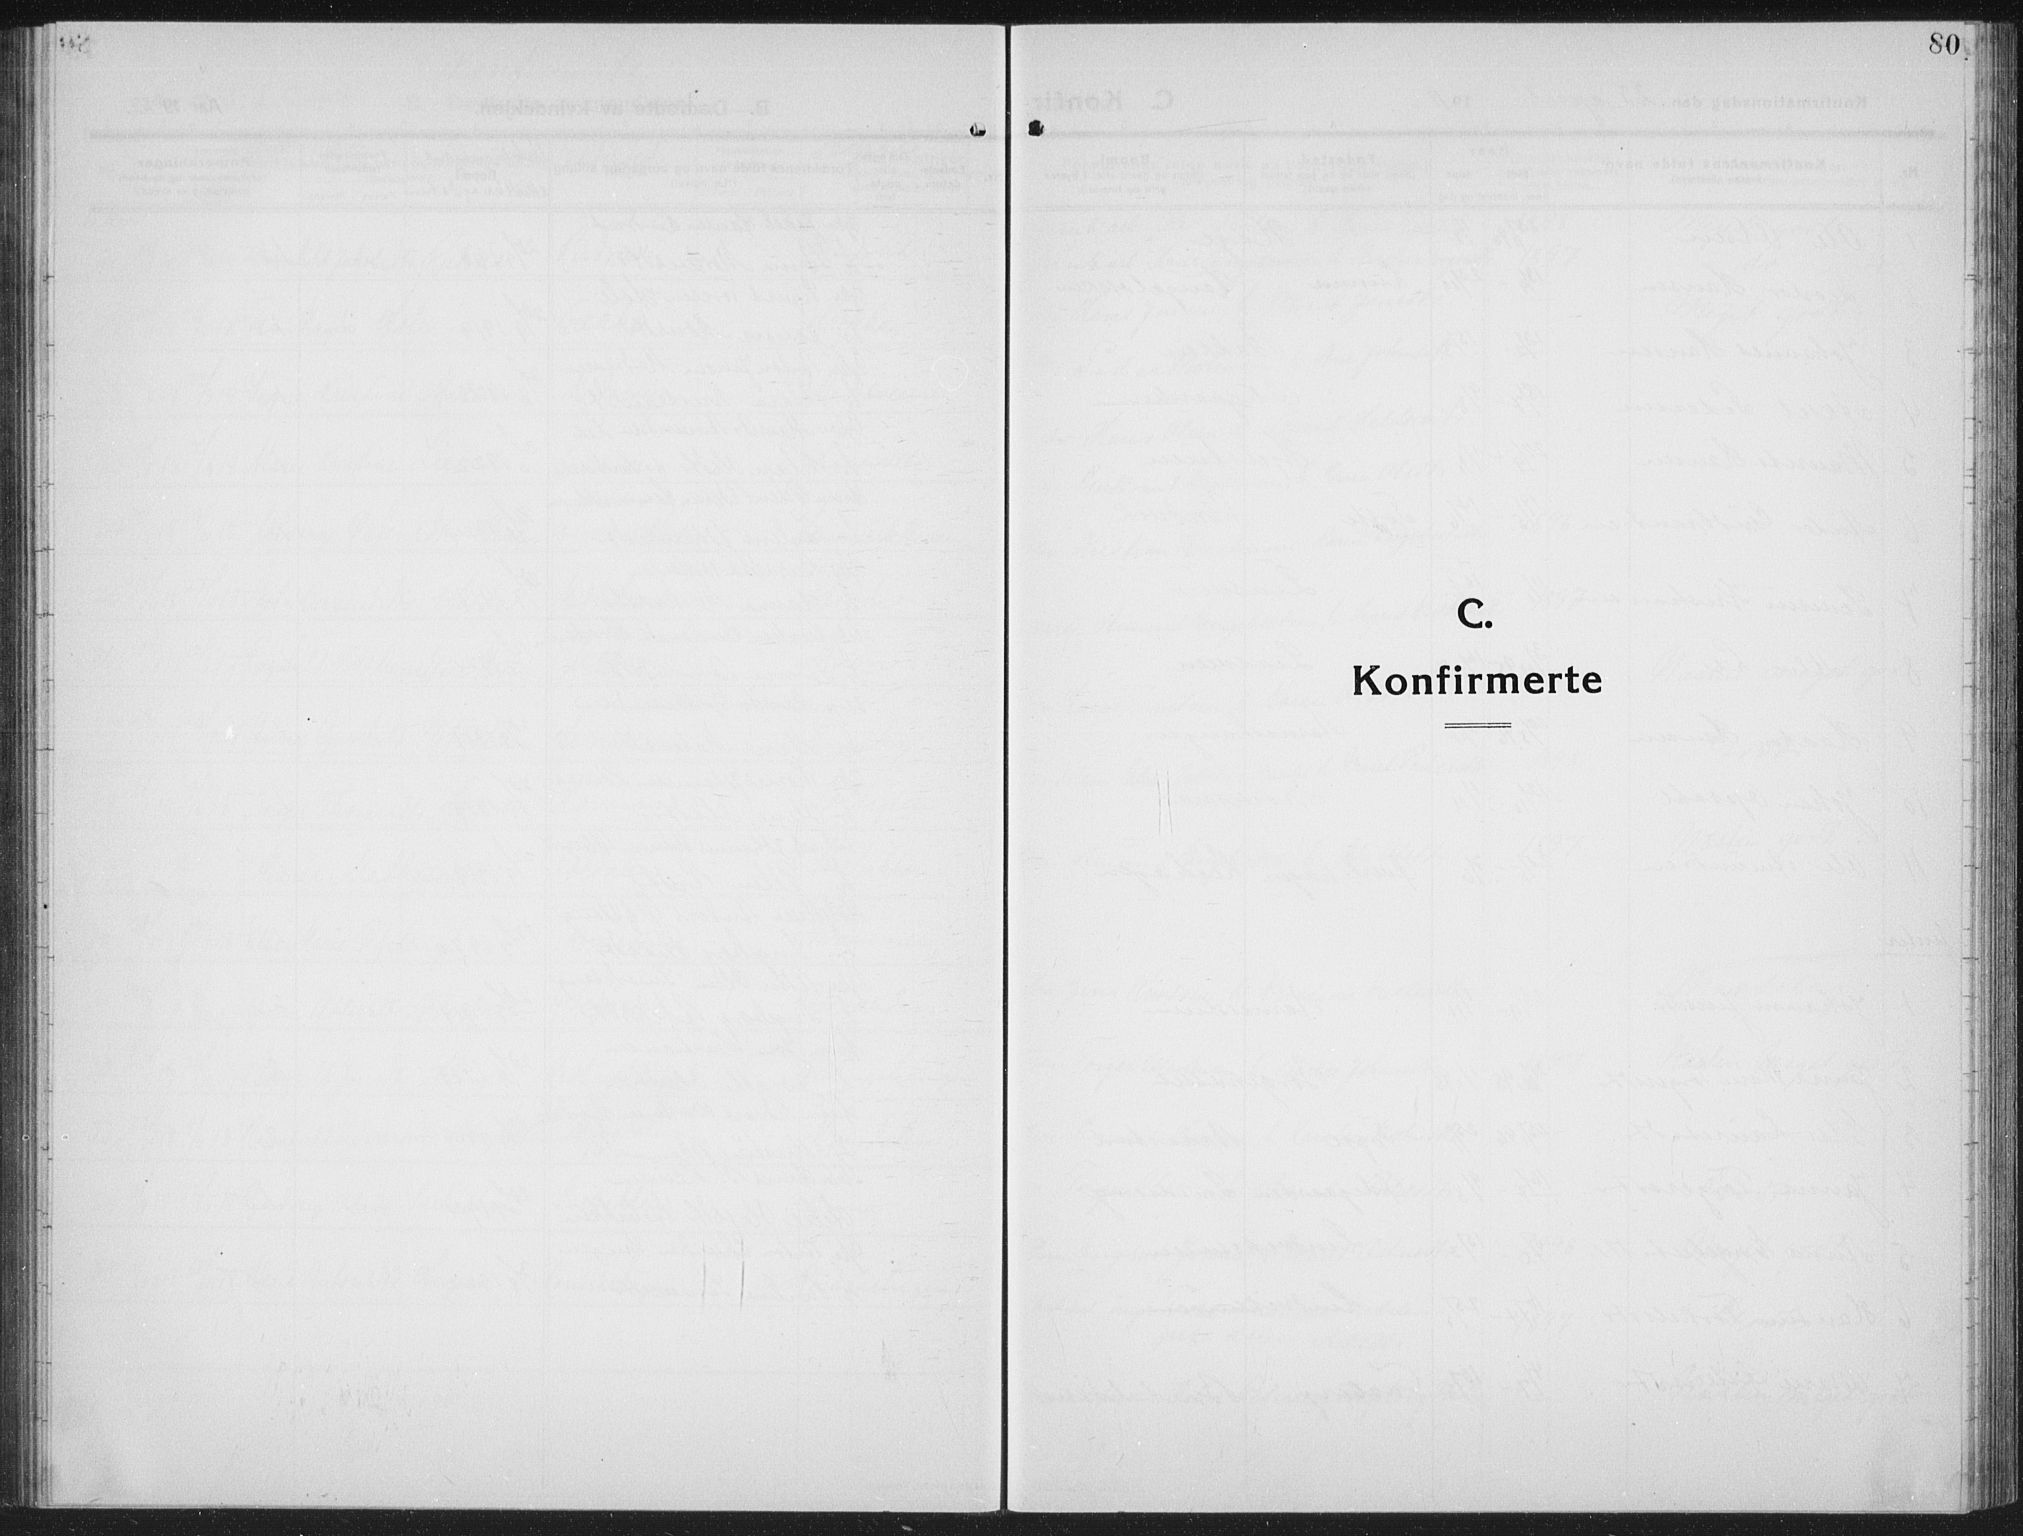 SAH, Ringebu prestekontor, Klokkerbok nr. 10, 1911-1934, s. 80